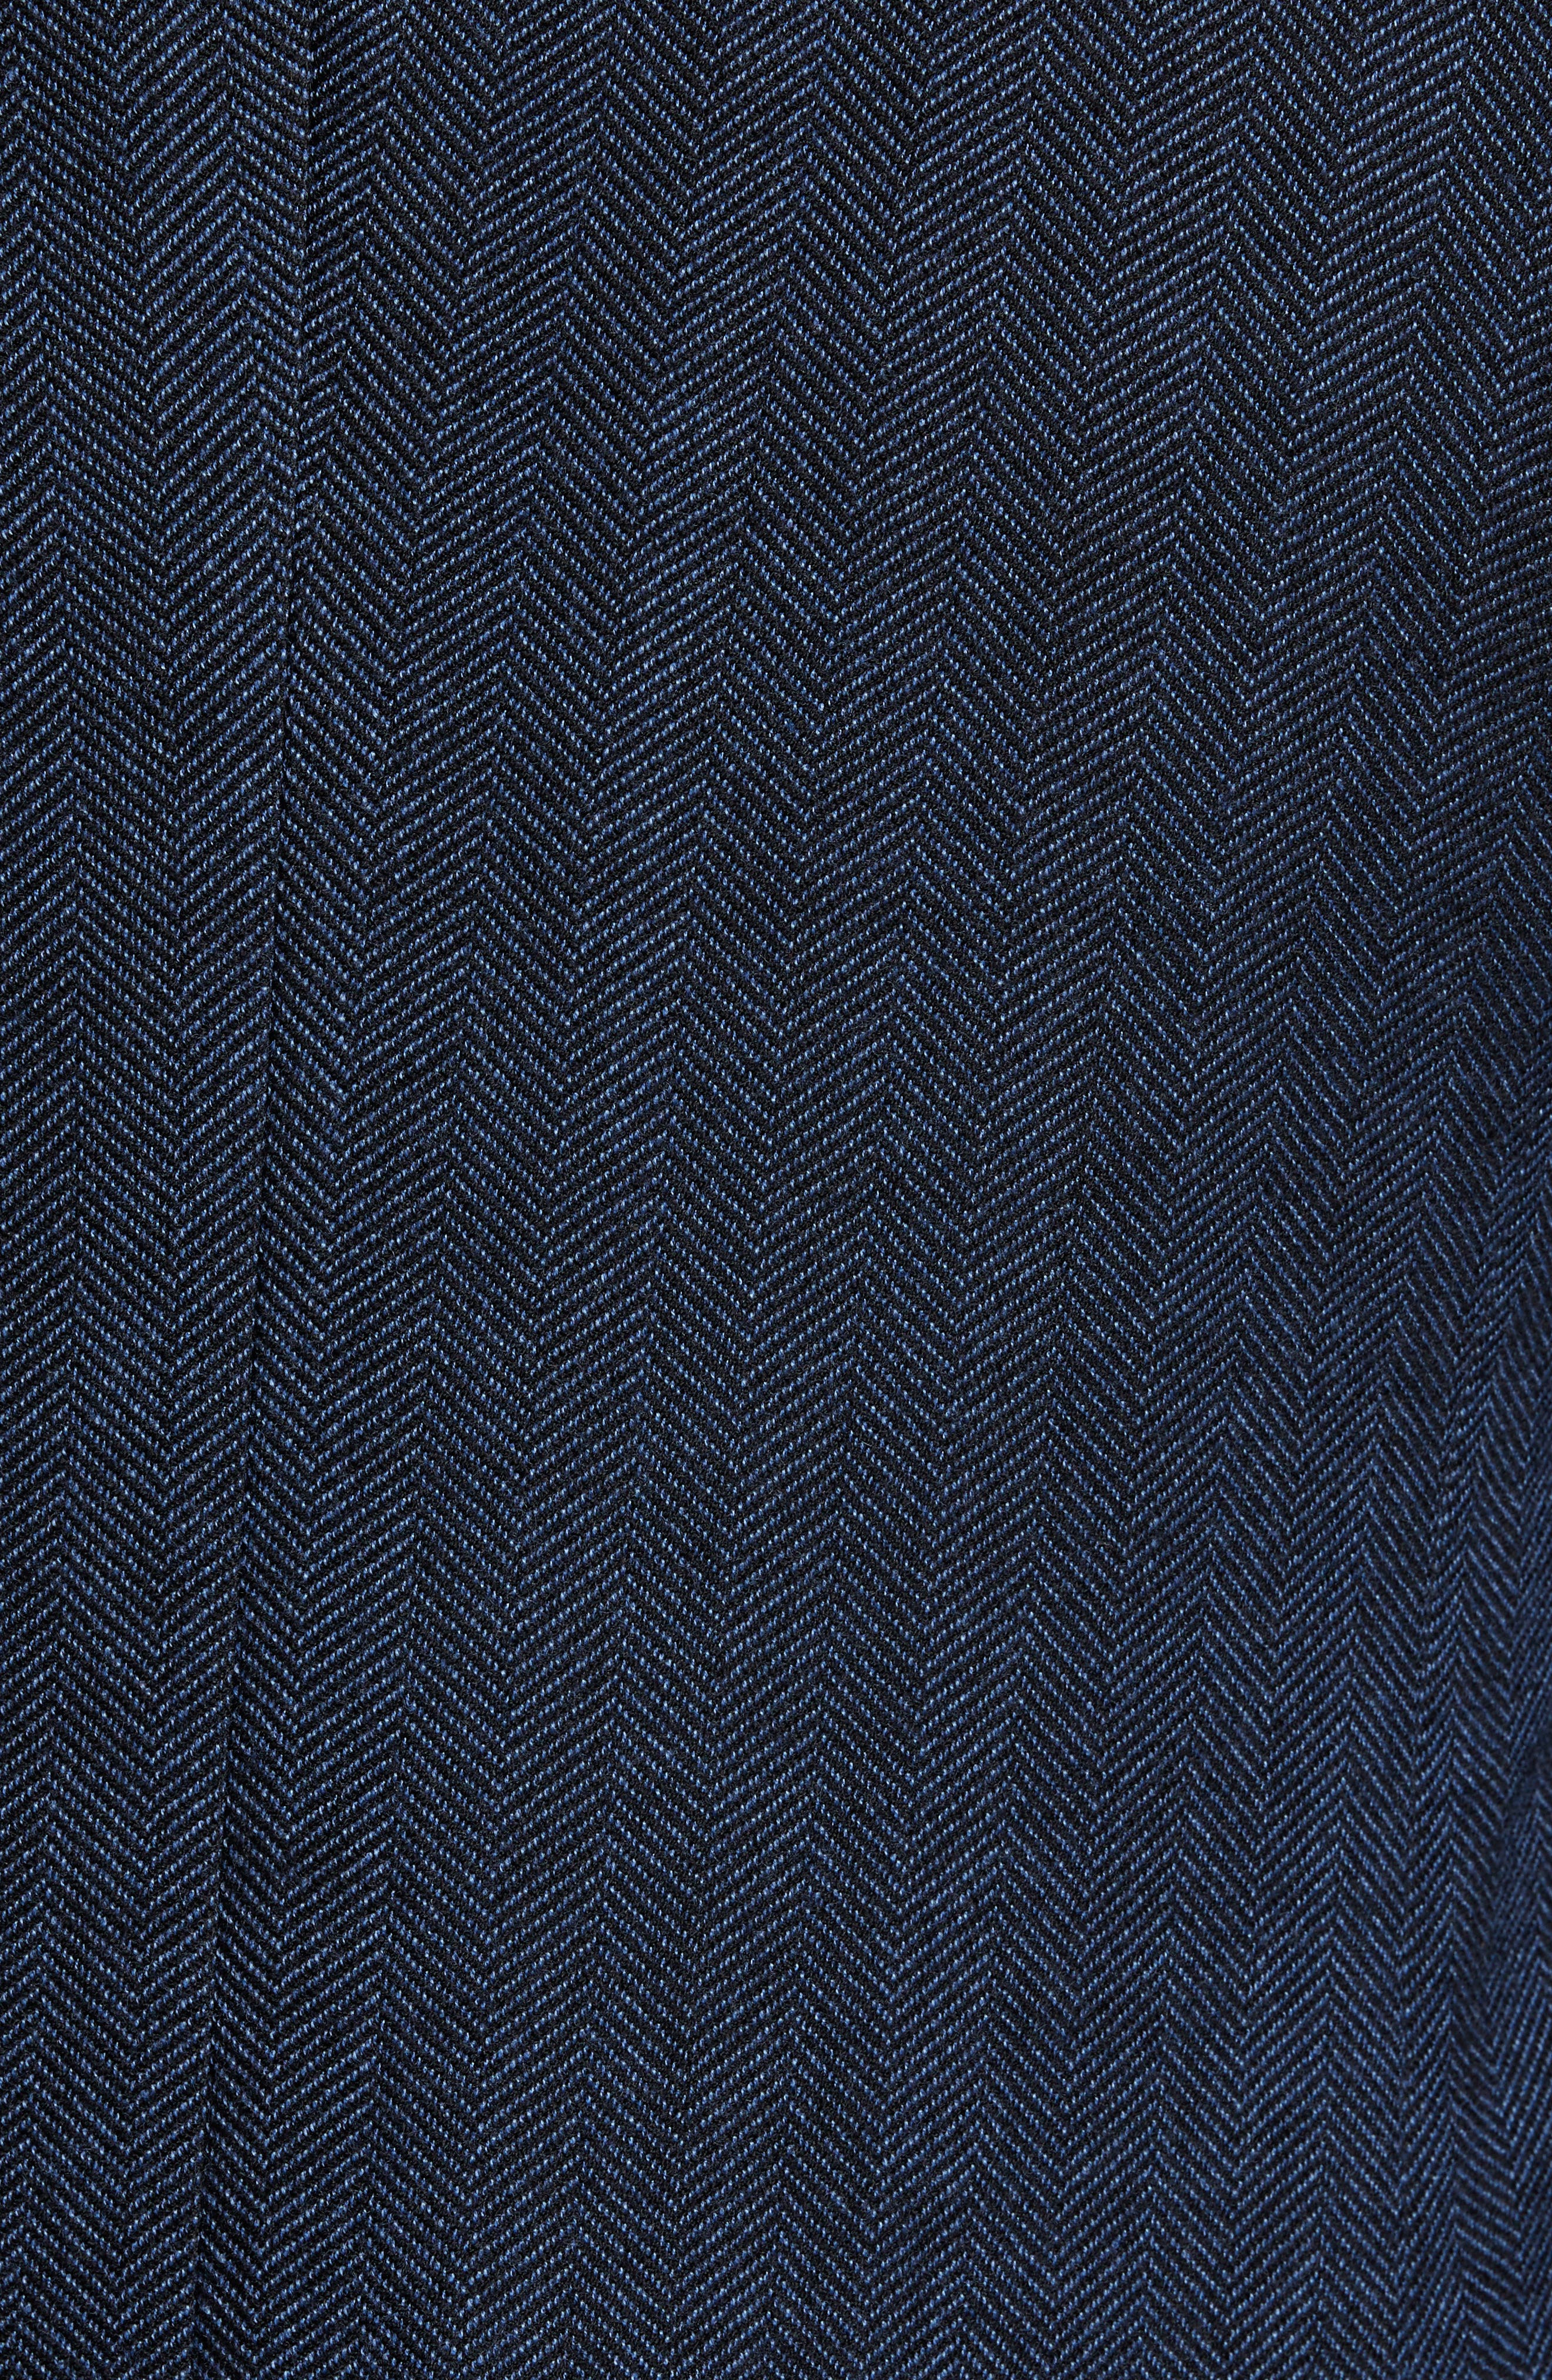 Nanon Trim Fit Herringbone Wool & Cotton Sport Coat,                             Alternate thumbnail 6, color,                             OPEN BLUE